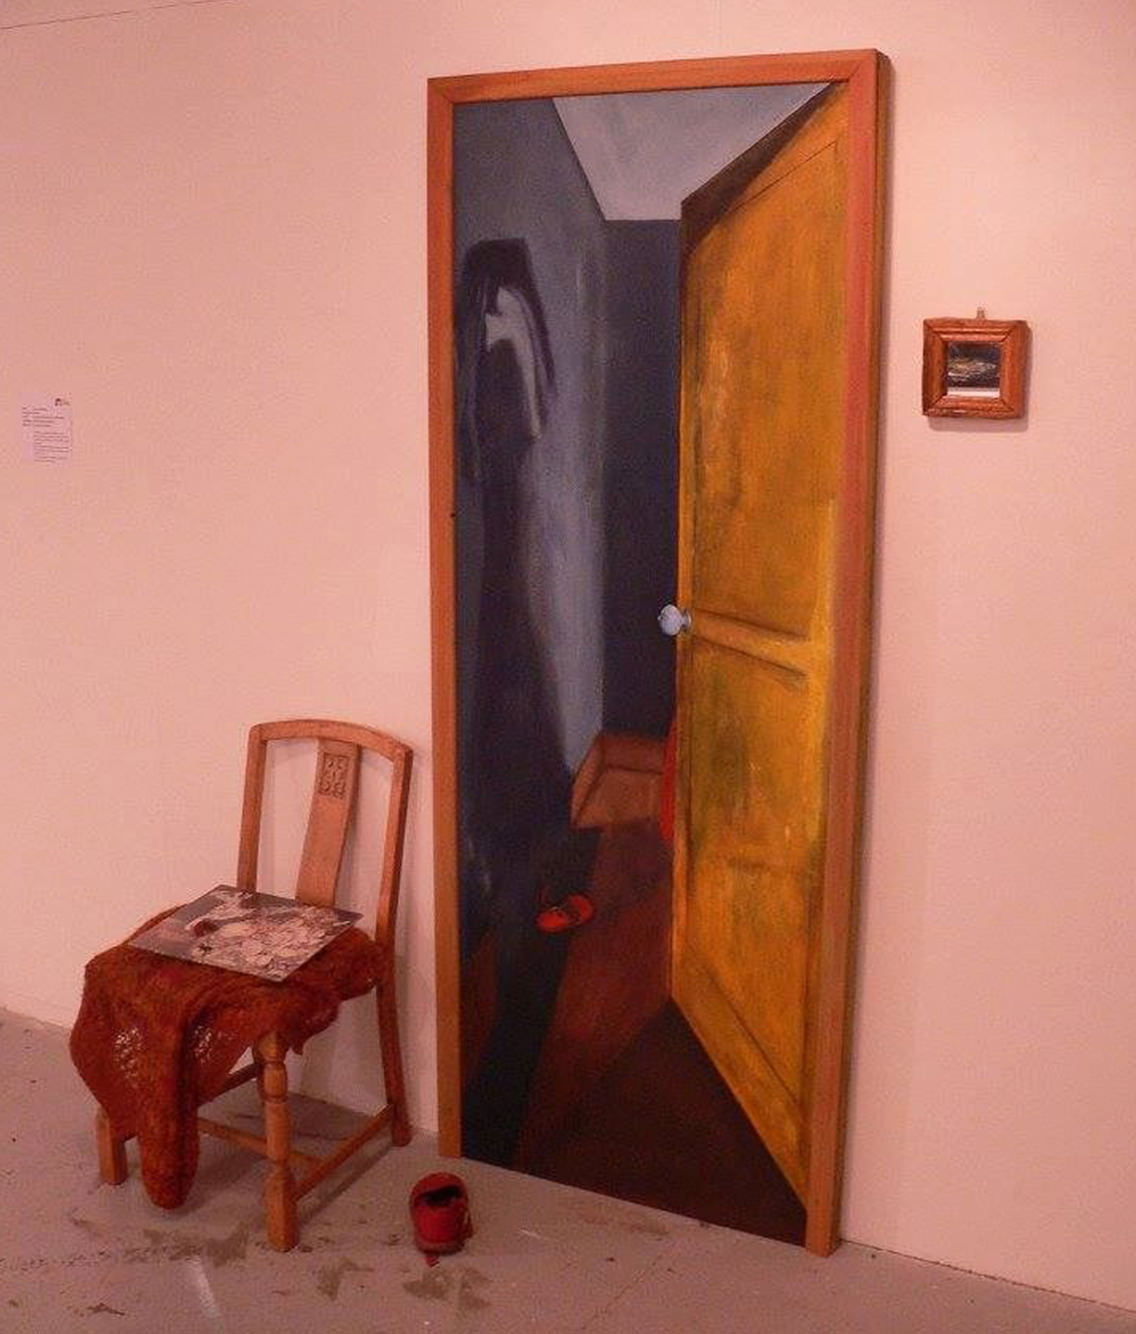 agnieska siwonia eco aga design exhibition painting